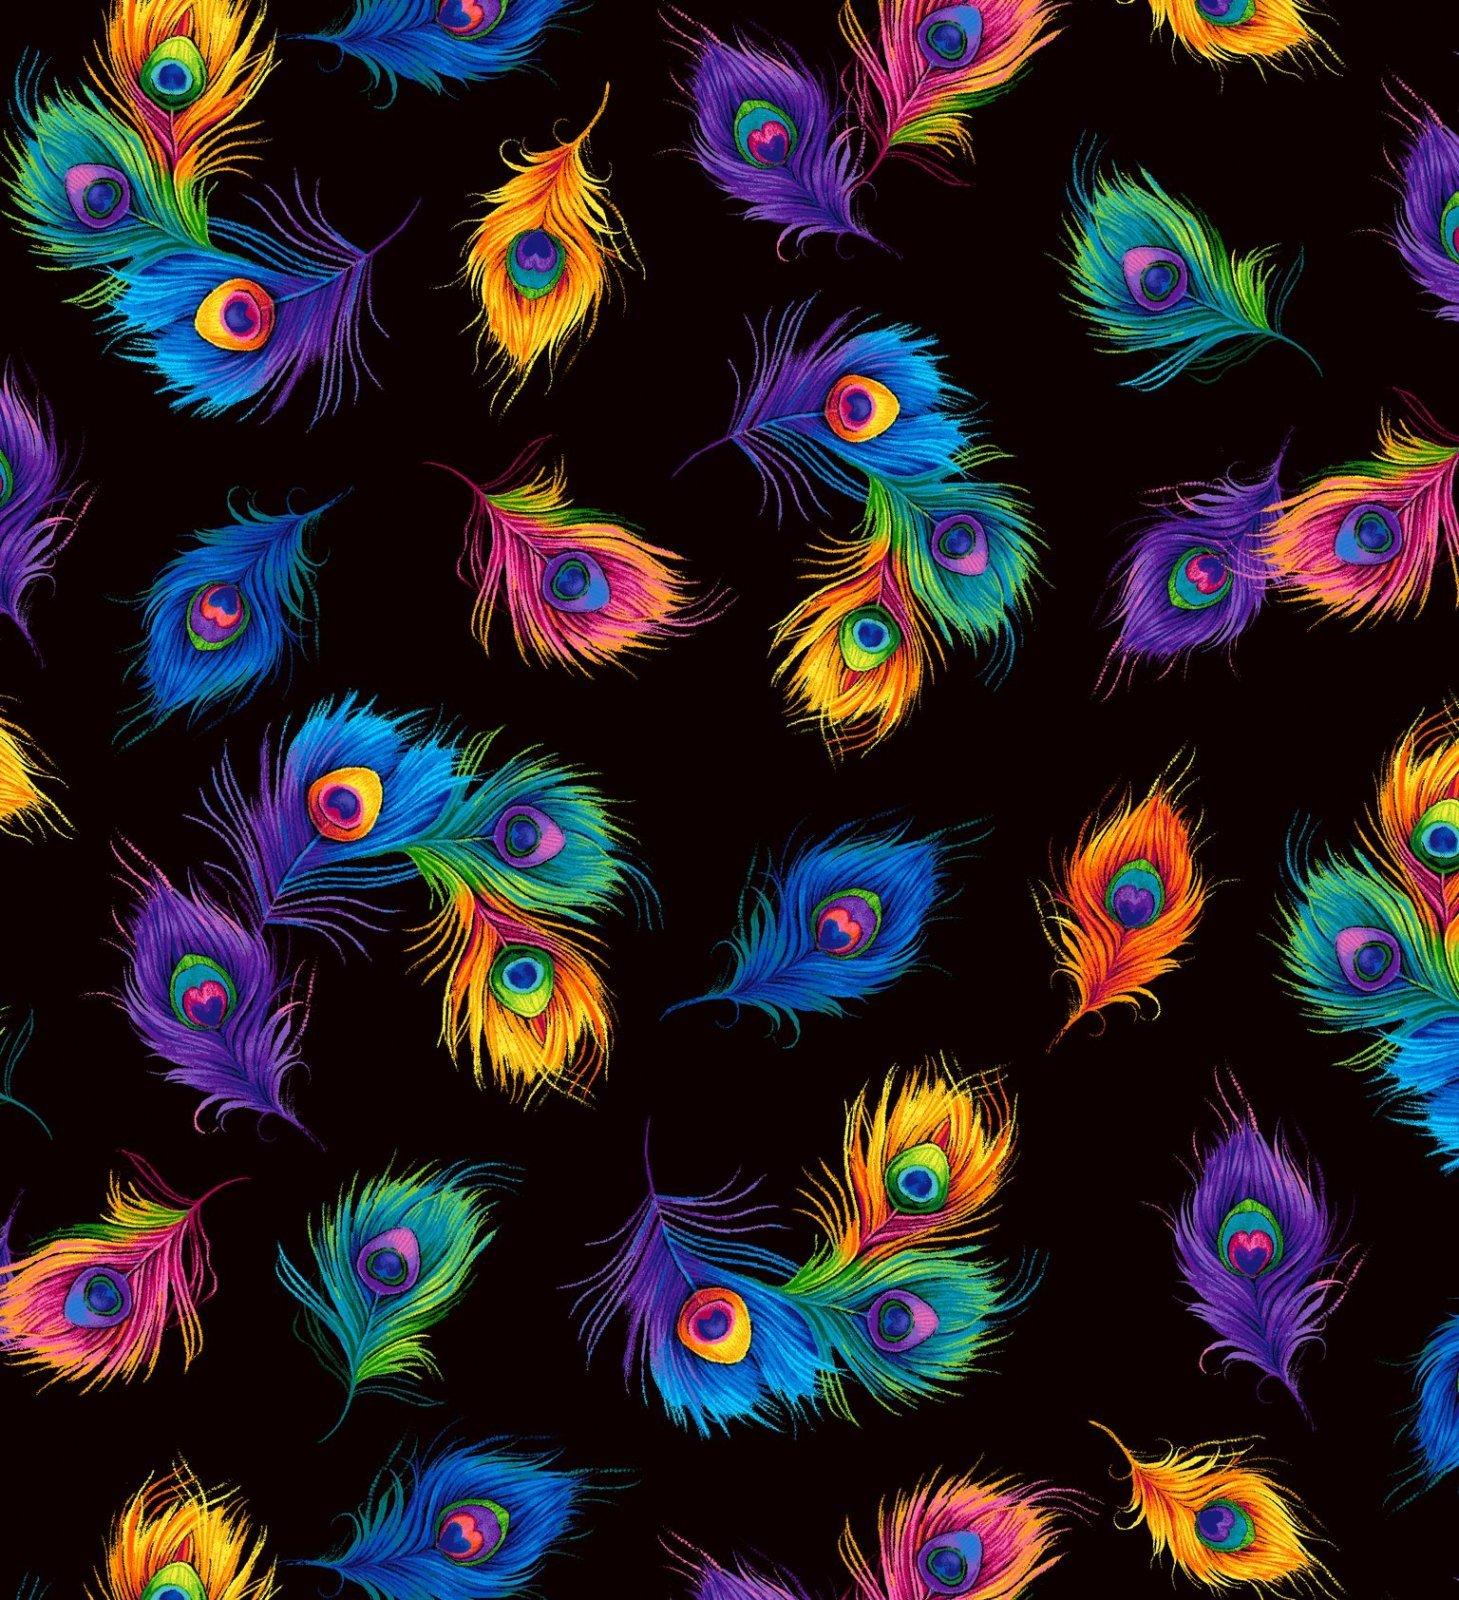 Rainbow Peacock C8413 Tossed Feathers